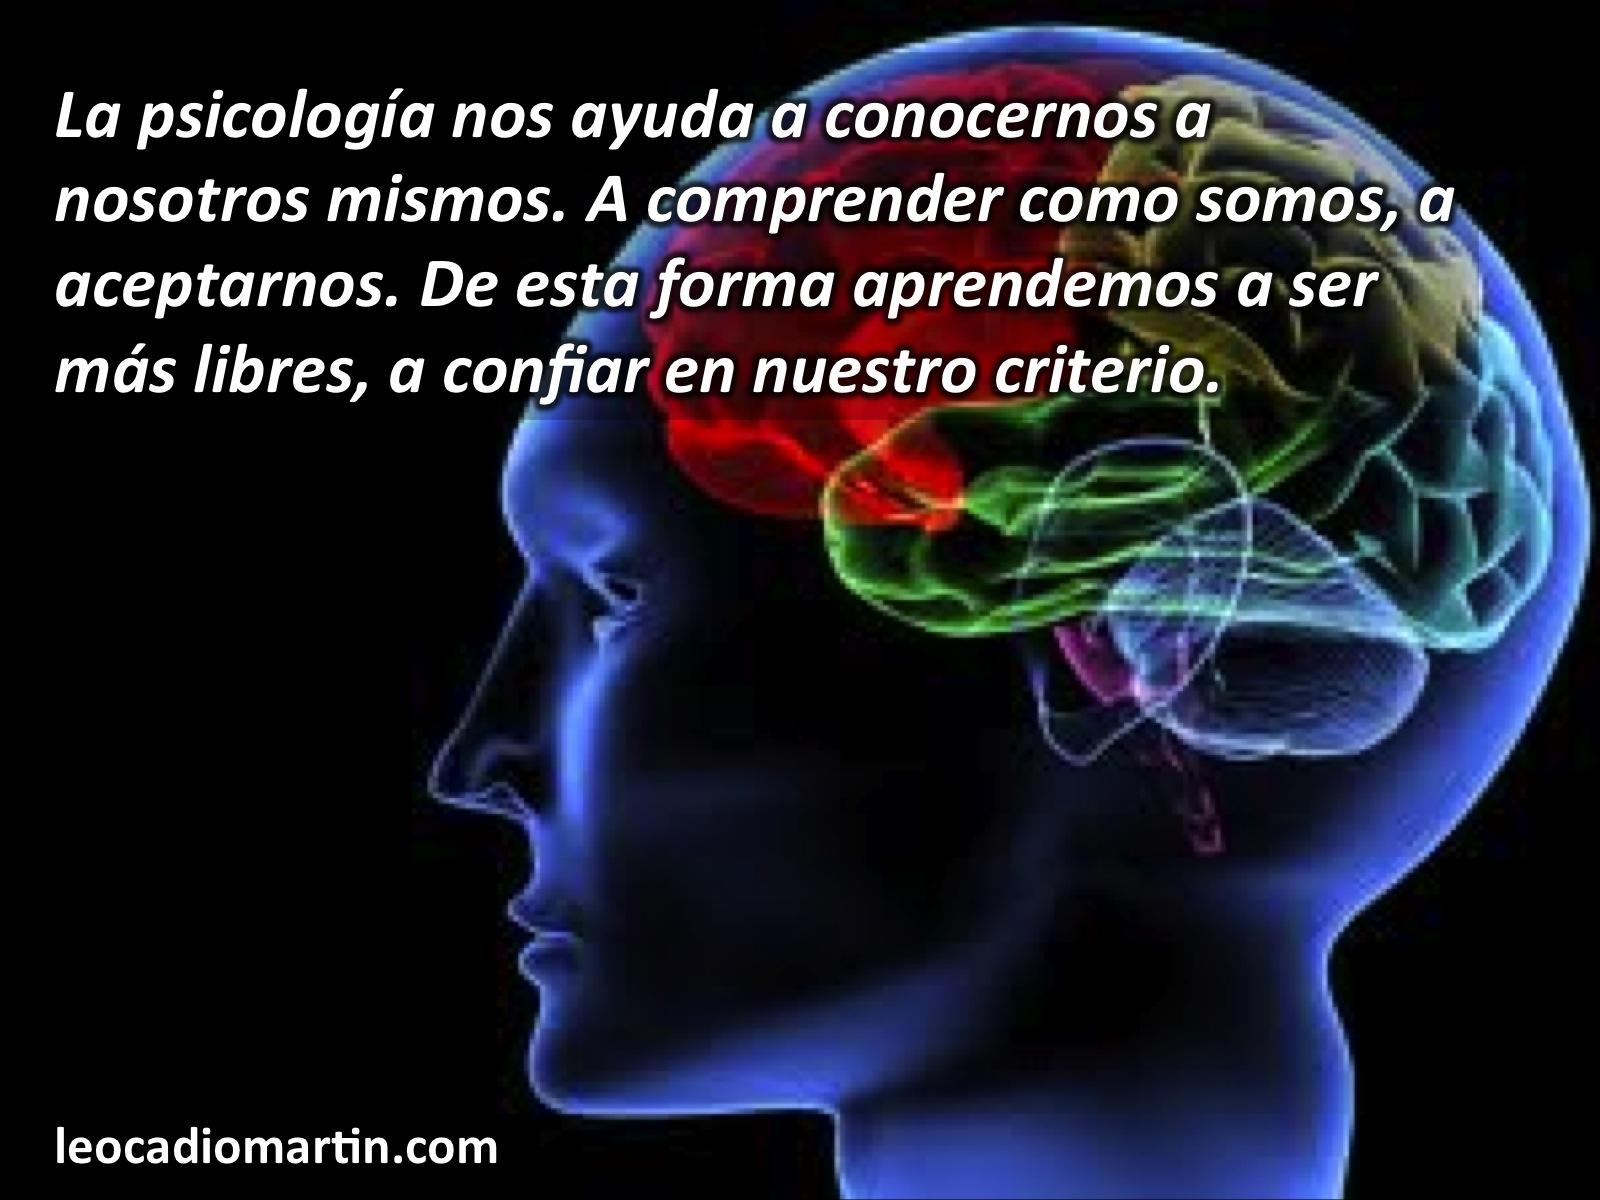 las personas psicologia: